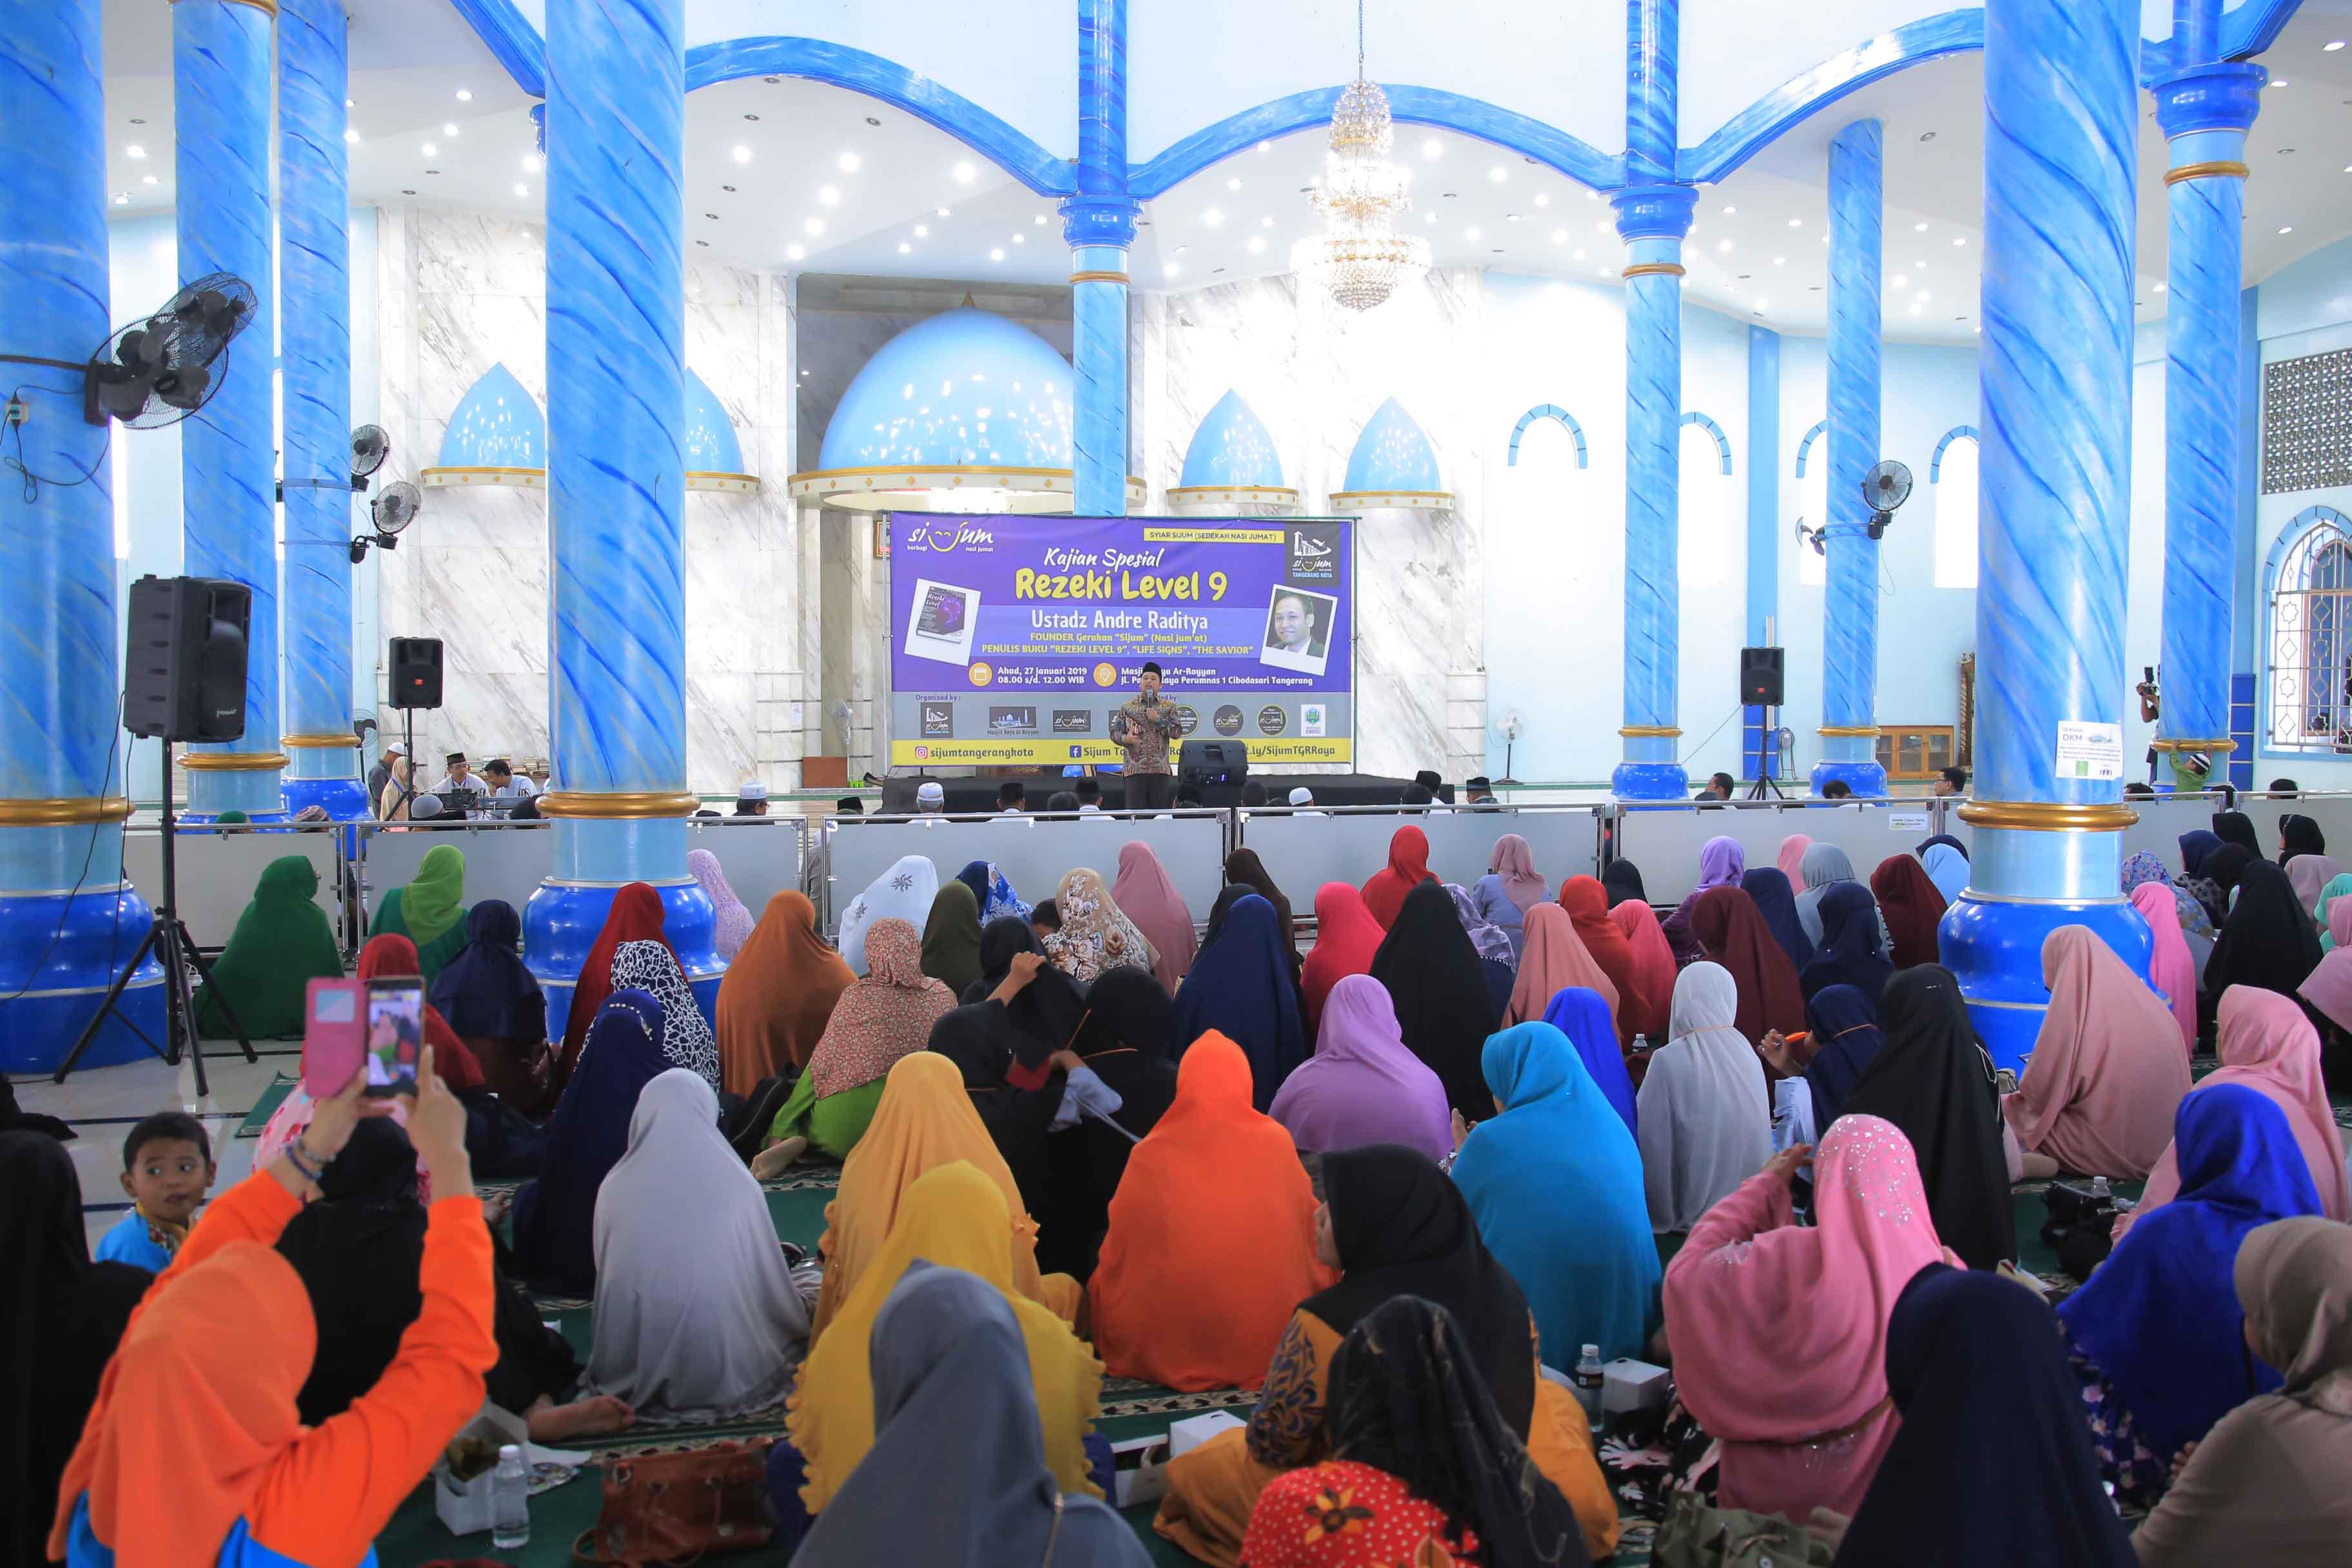 Kajian Spesial Rezeki Level 9 yang diinisiasi komunitas Nasi Jumat (SiJum) di Masjid Raya Ar - Royyan